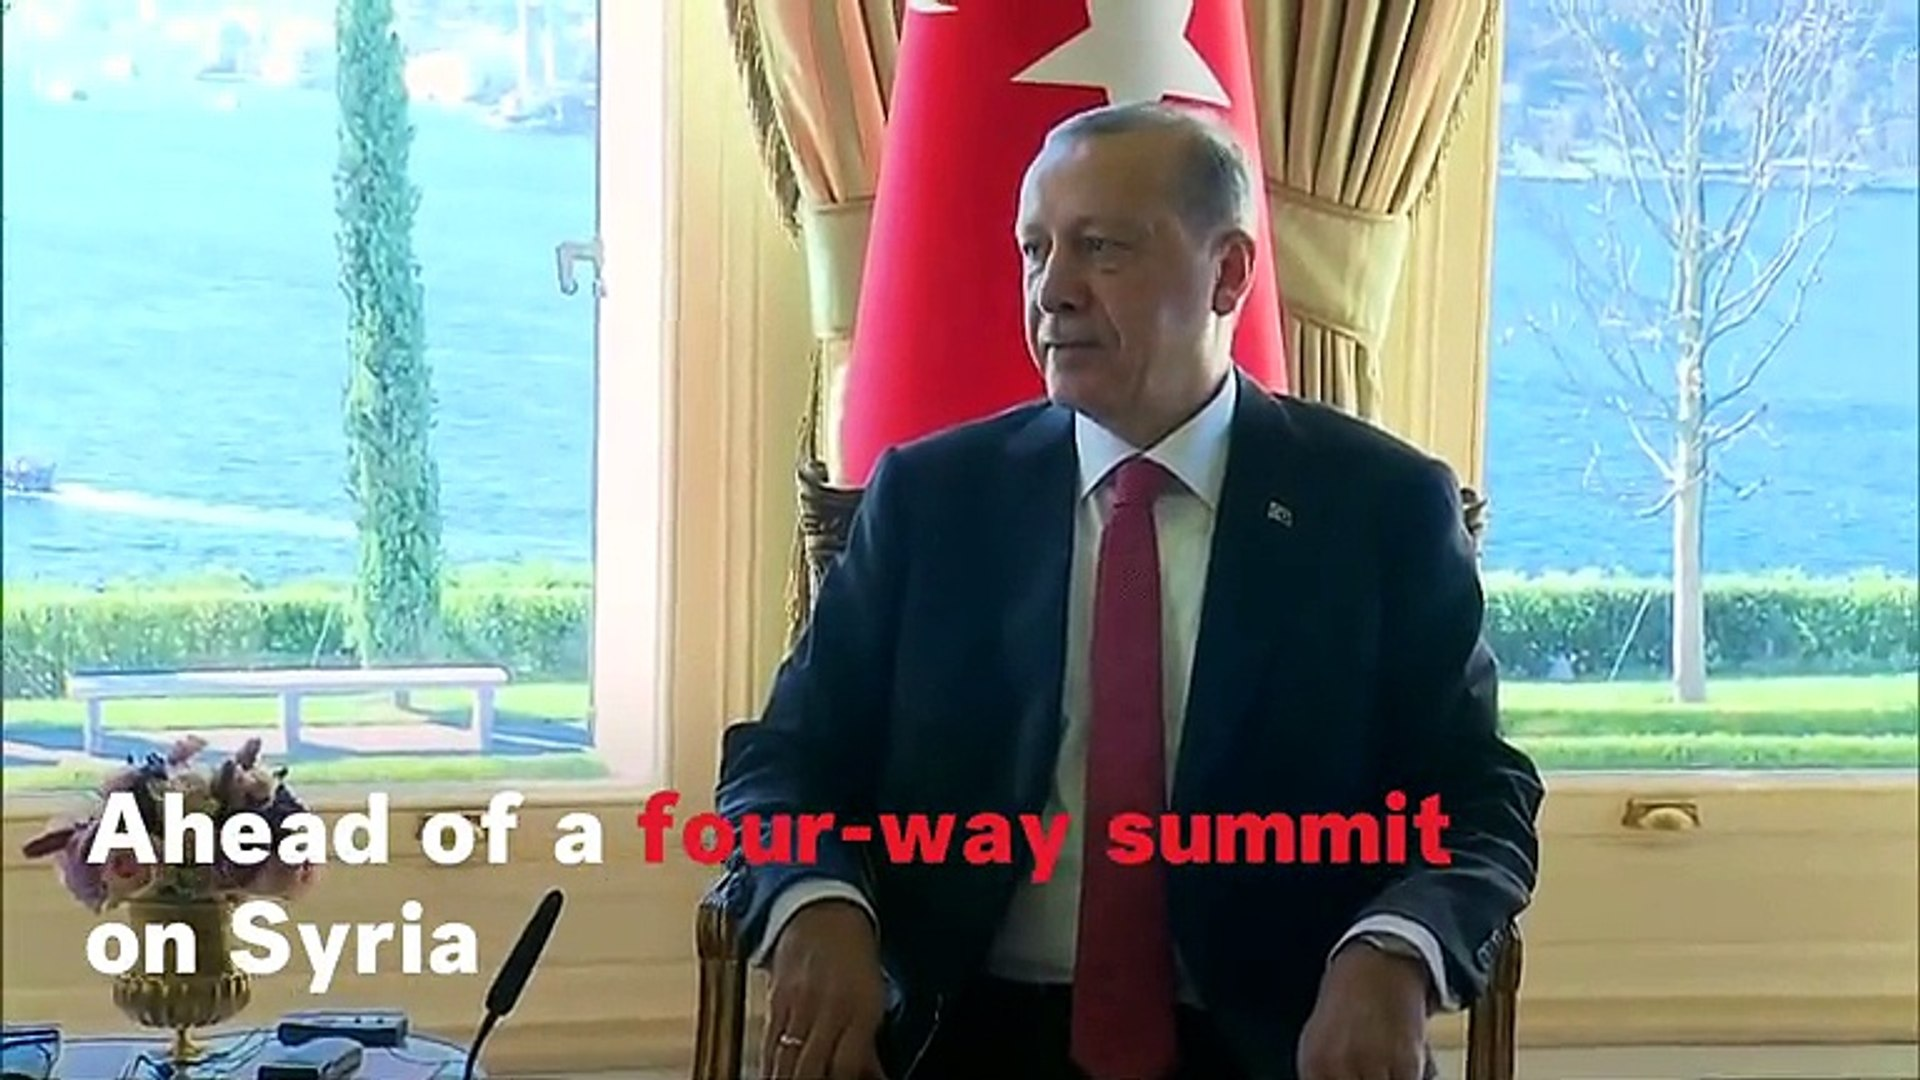 Vladimir Putin Meets With Tayyip Erdogan